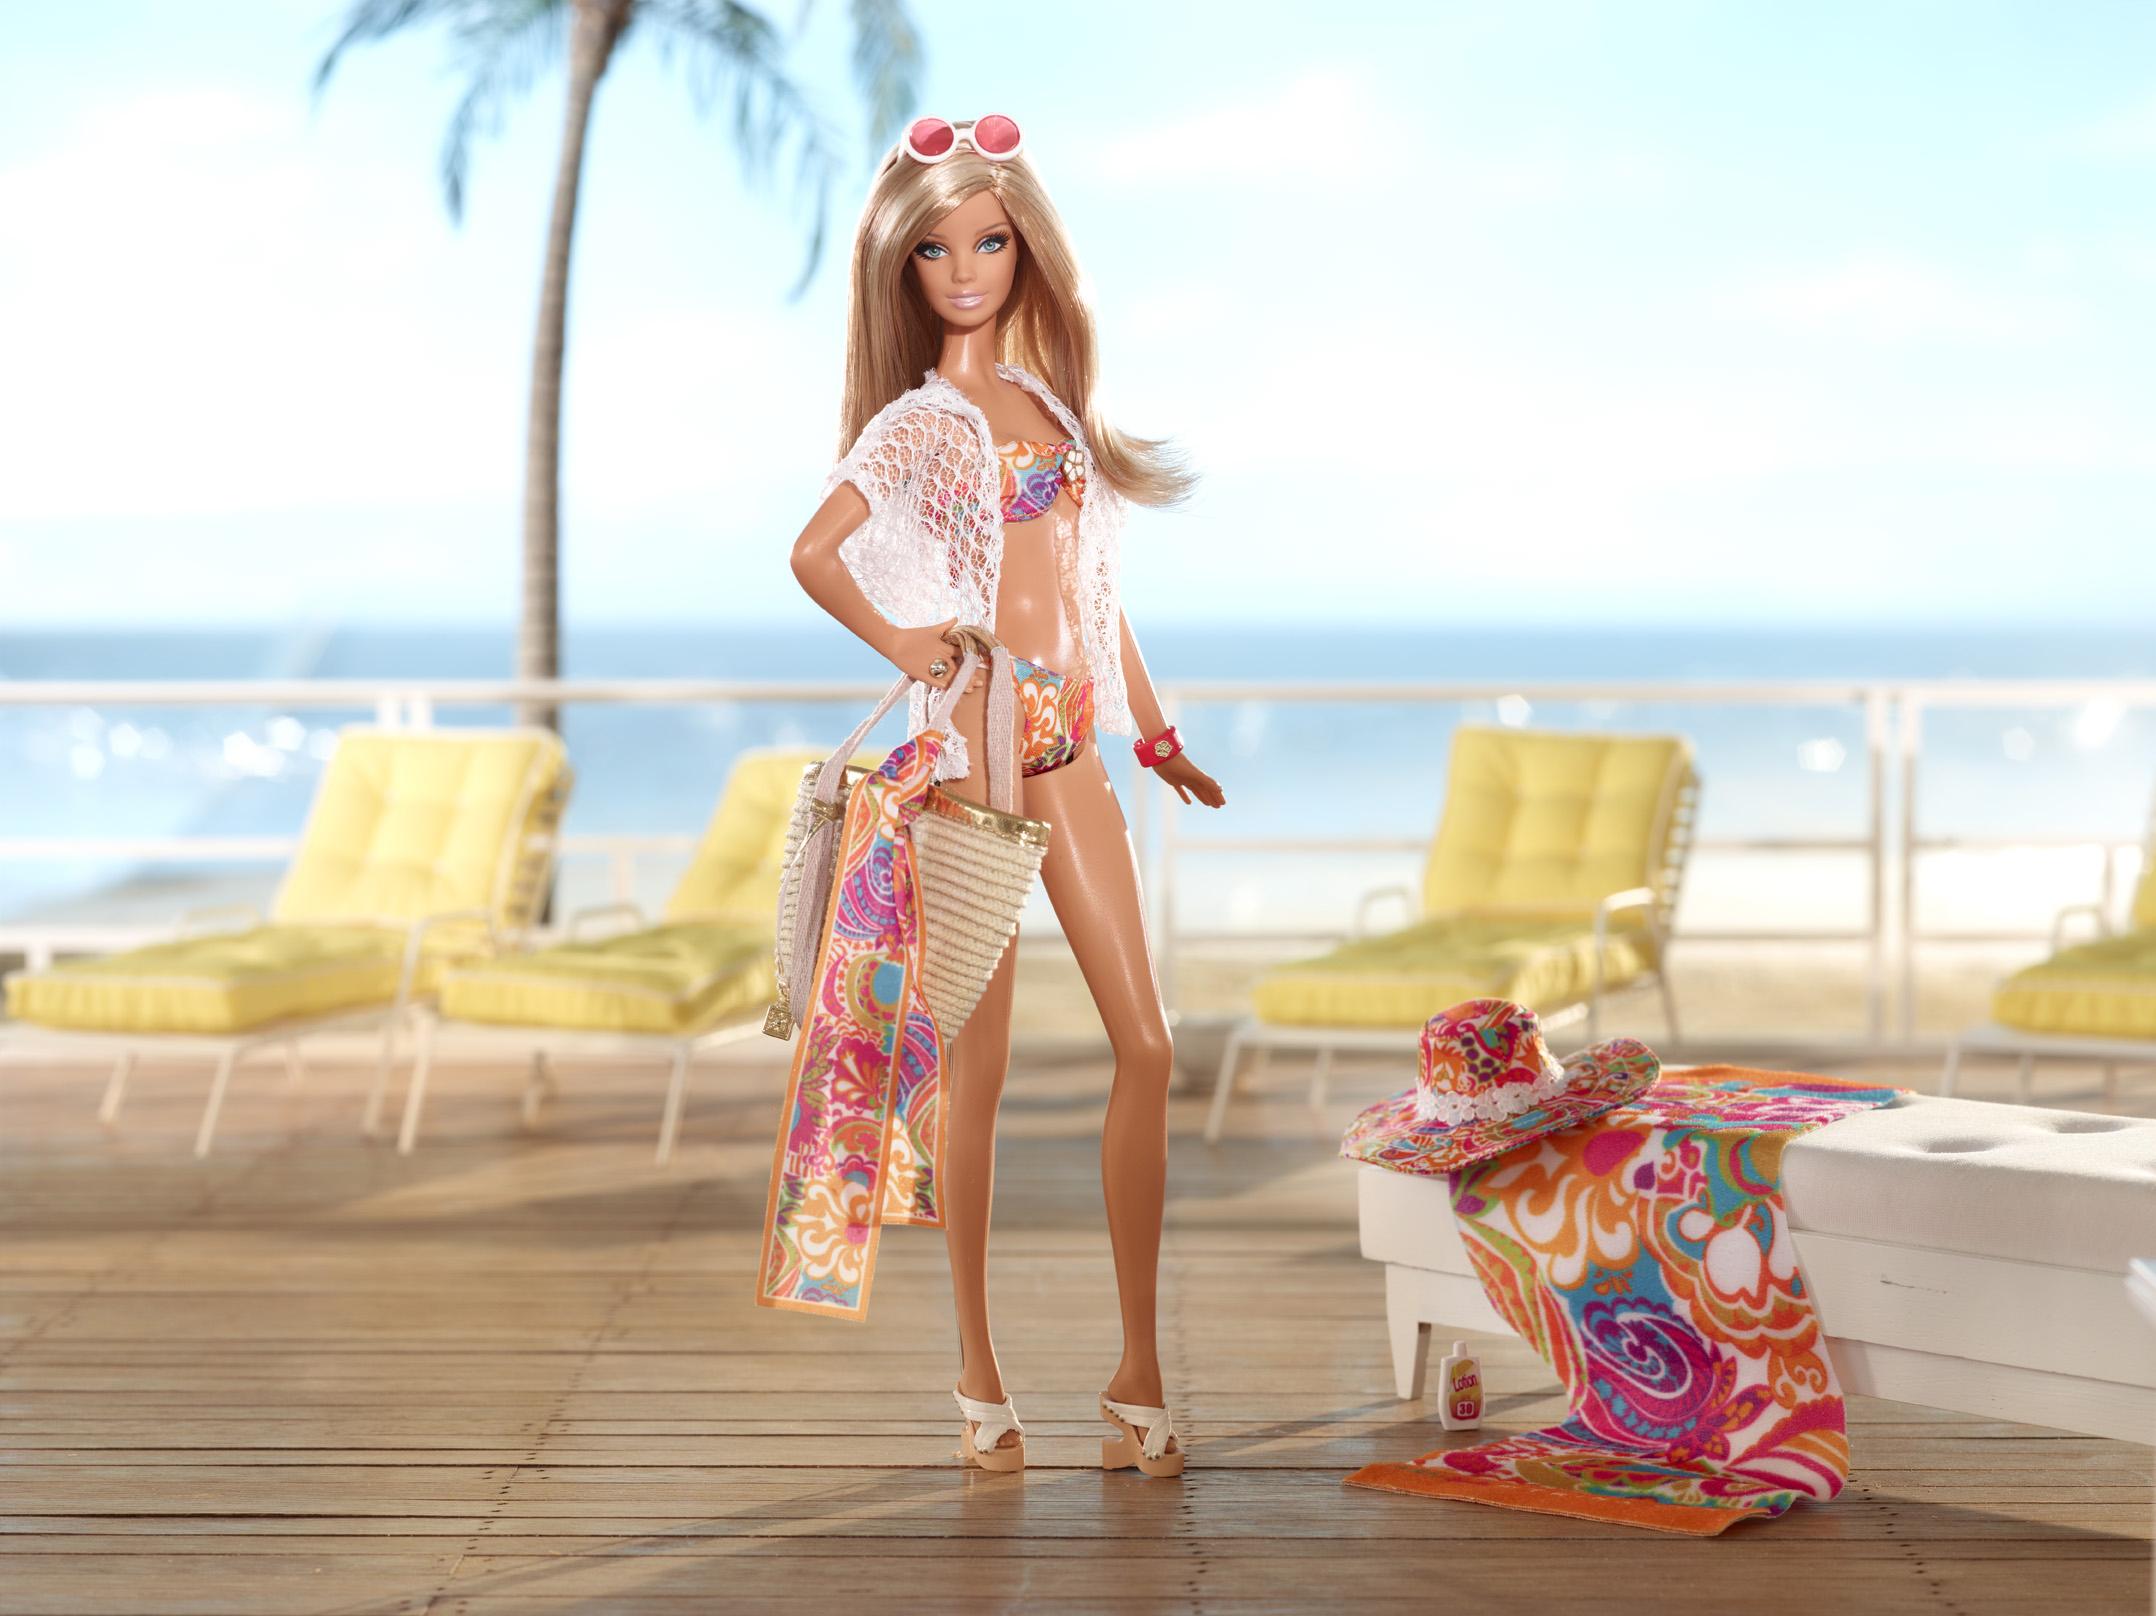 The Trina Turk Malibu Barbie Doll, released in 2013.